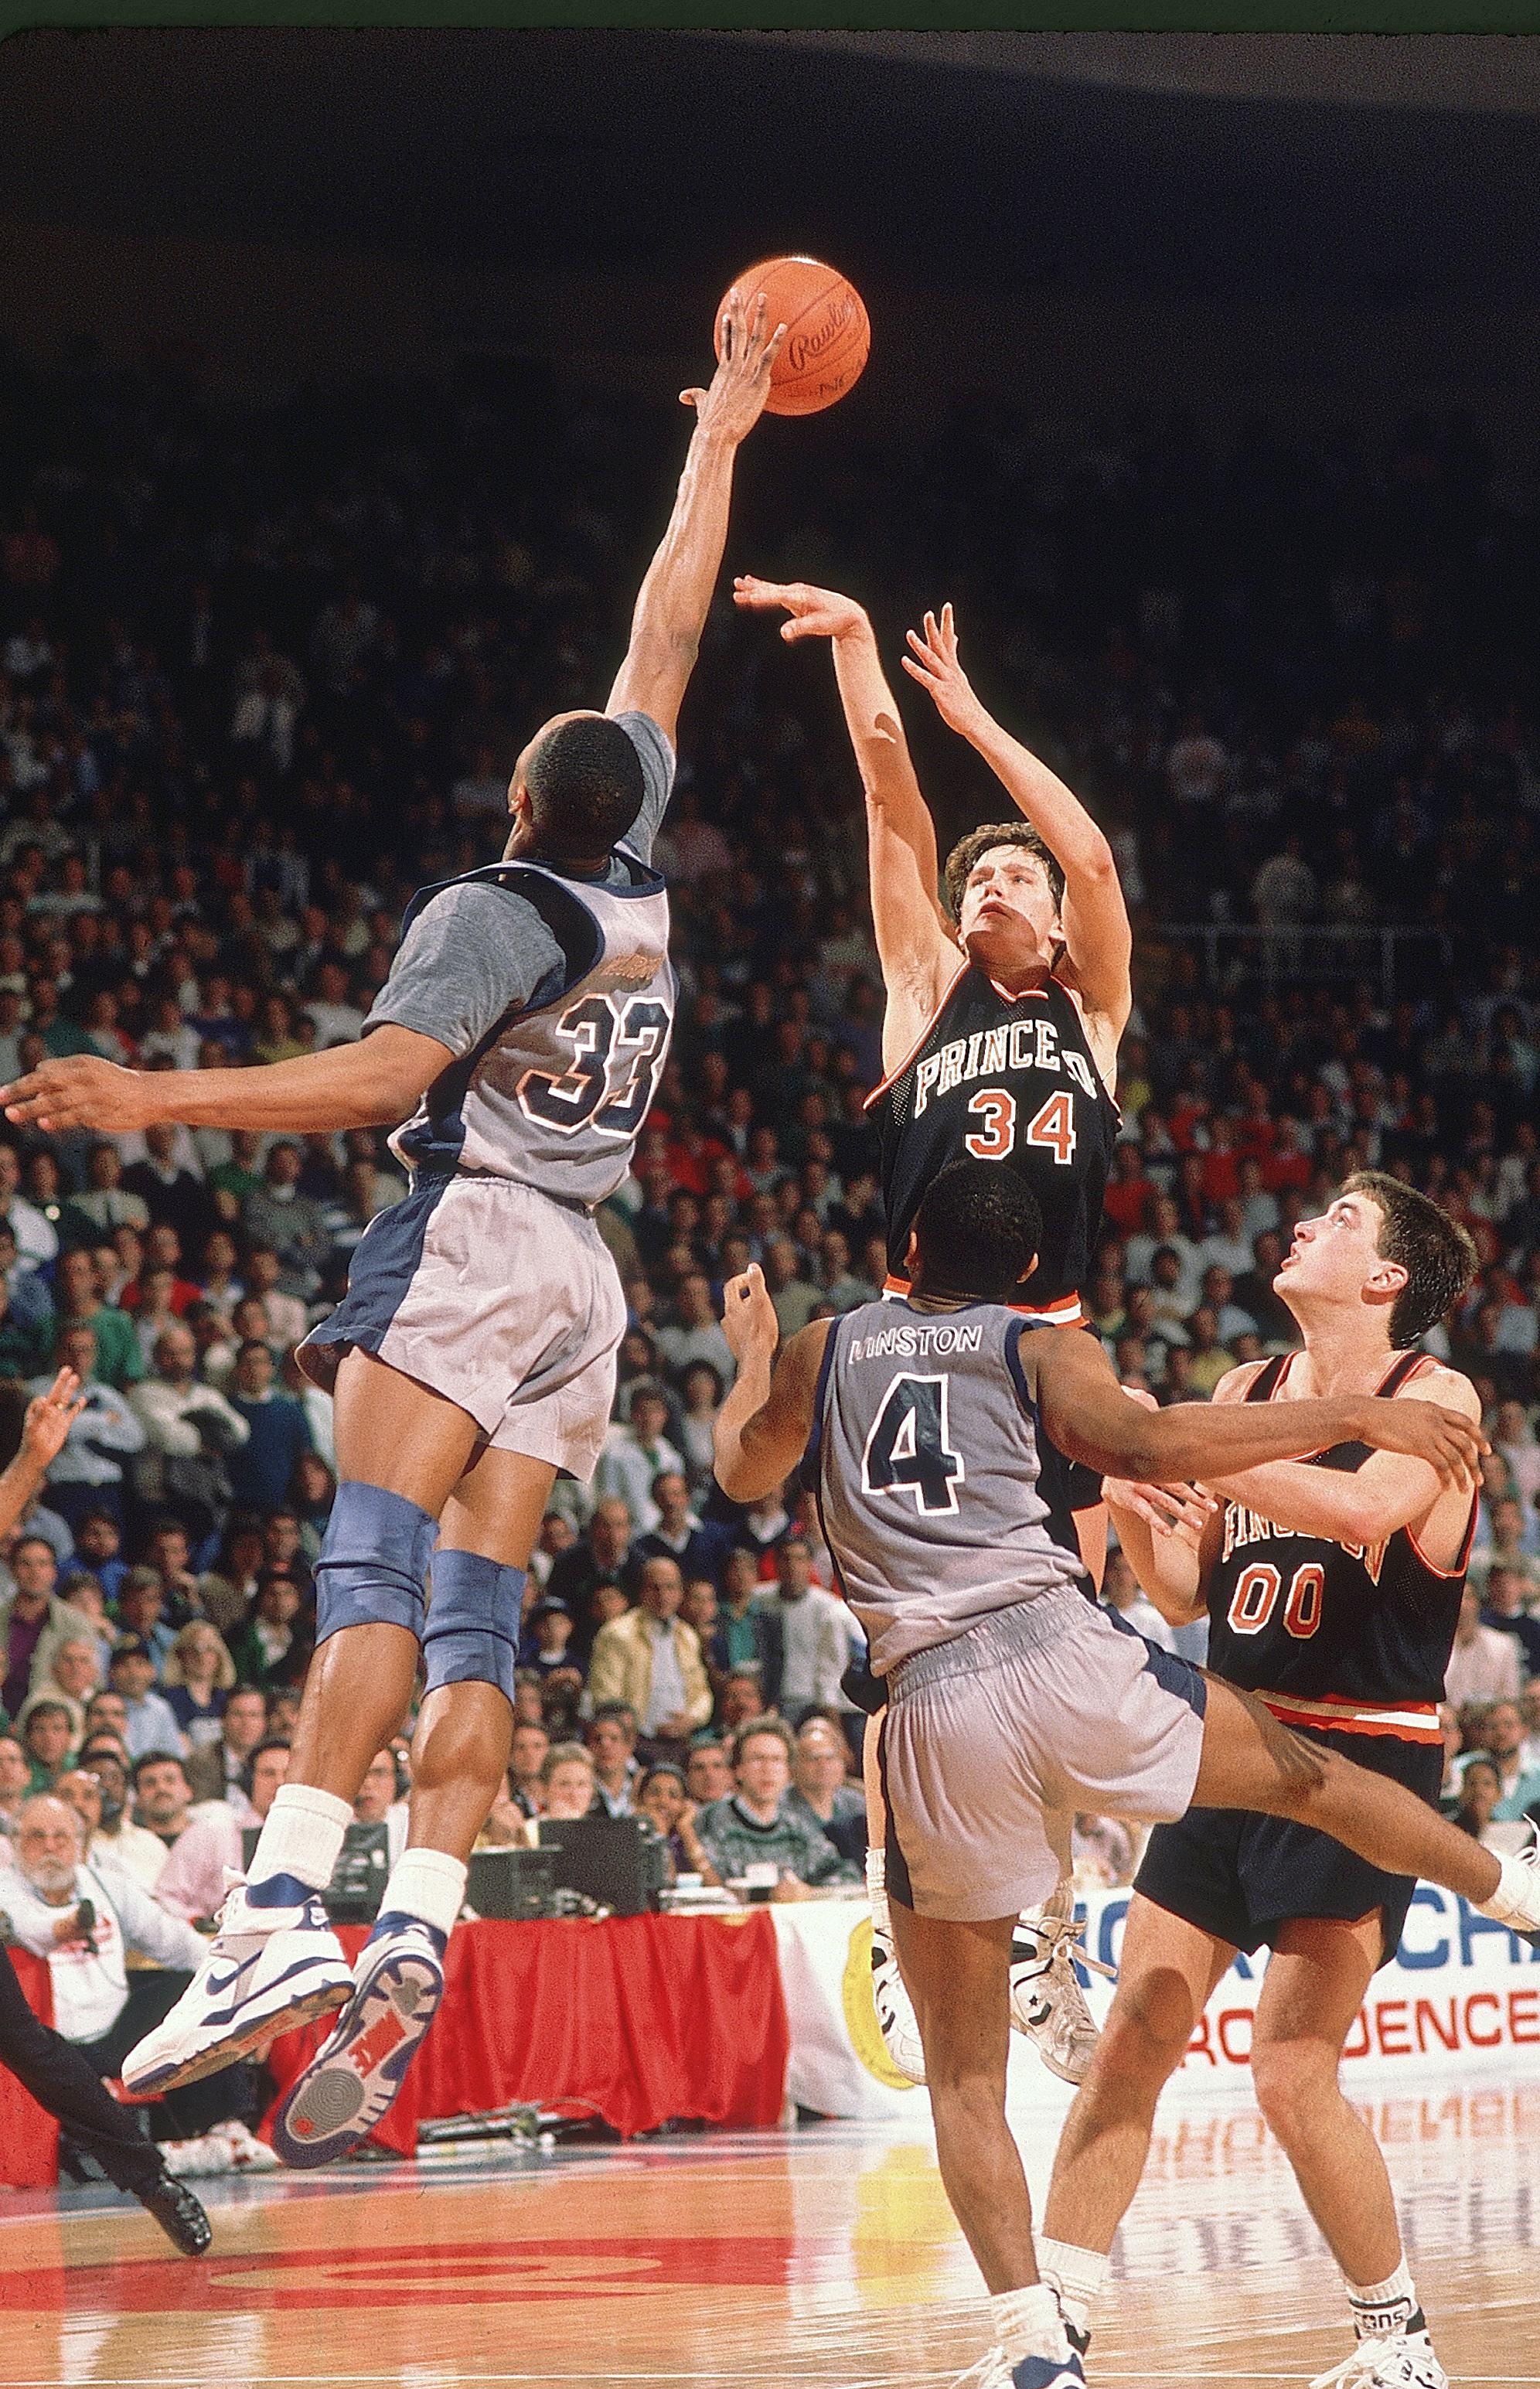 Georgetown University vs Princeton University, 1989 NCAA East Regional Playoffs Round 1